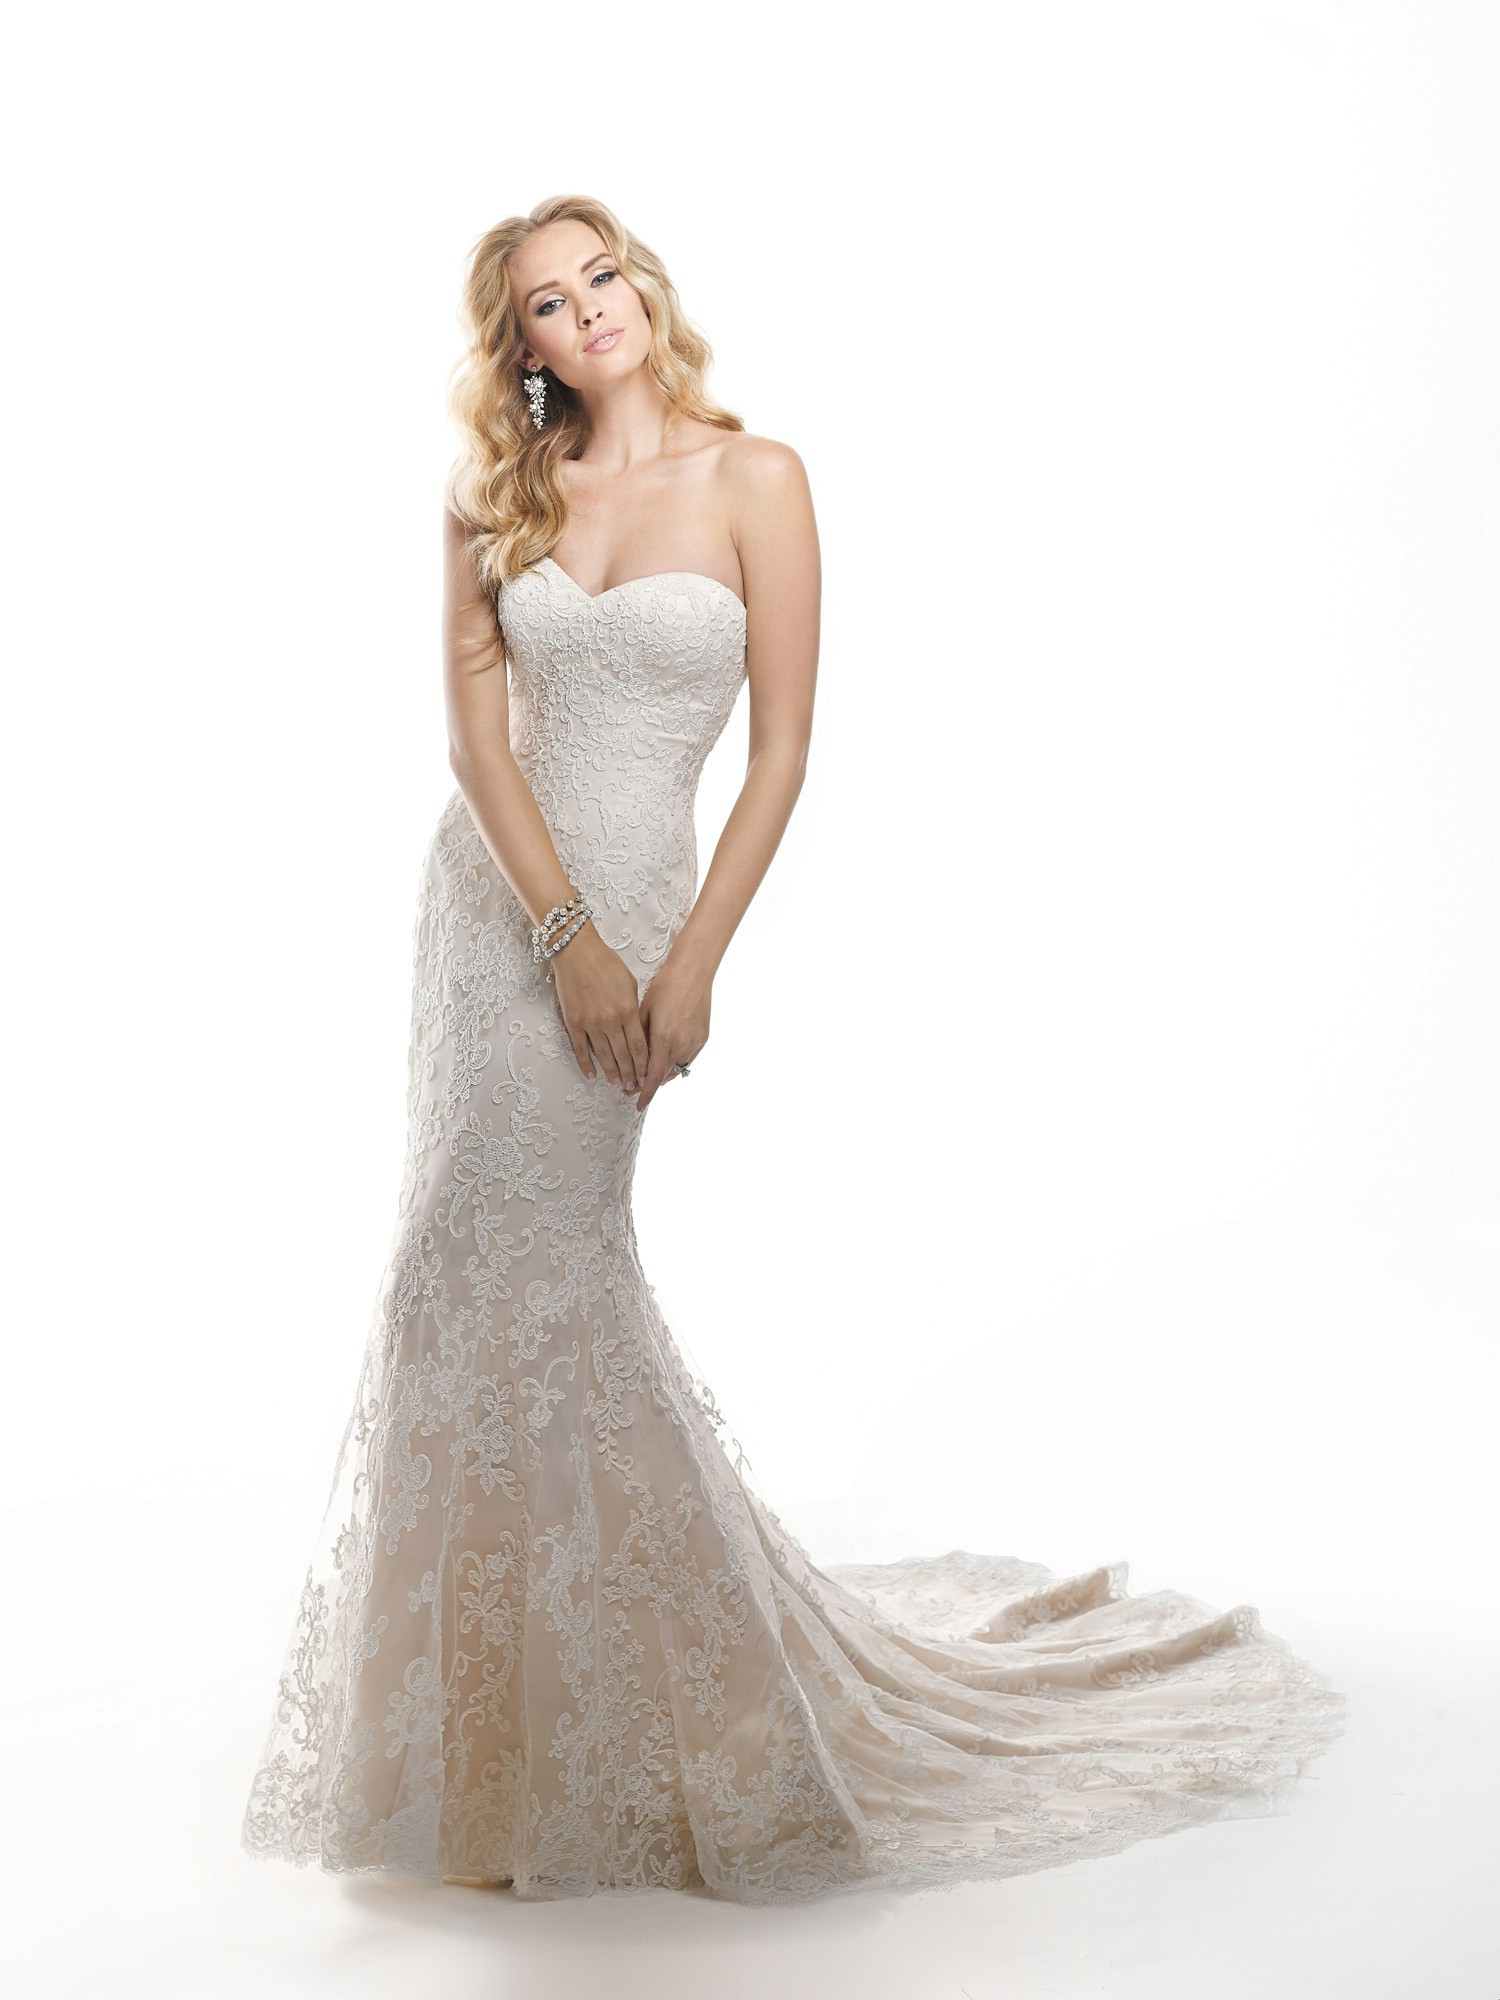 maggie sottero wedding dresses price photo - 1